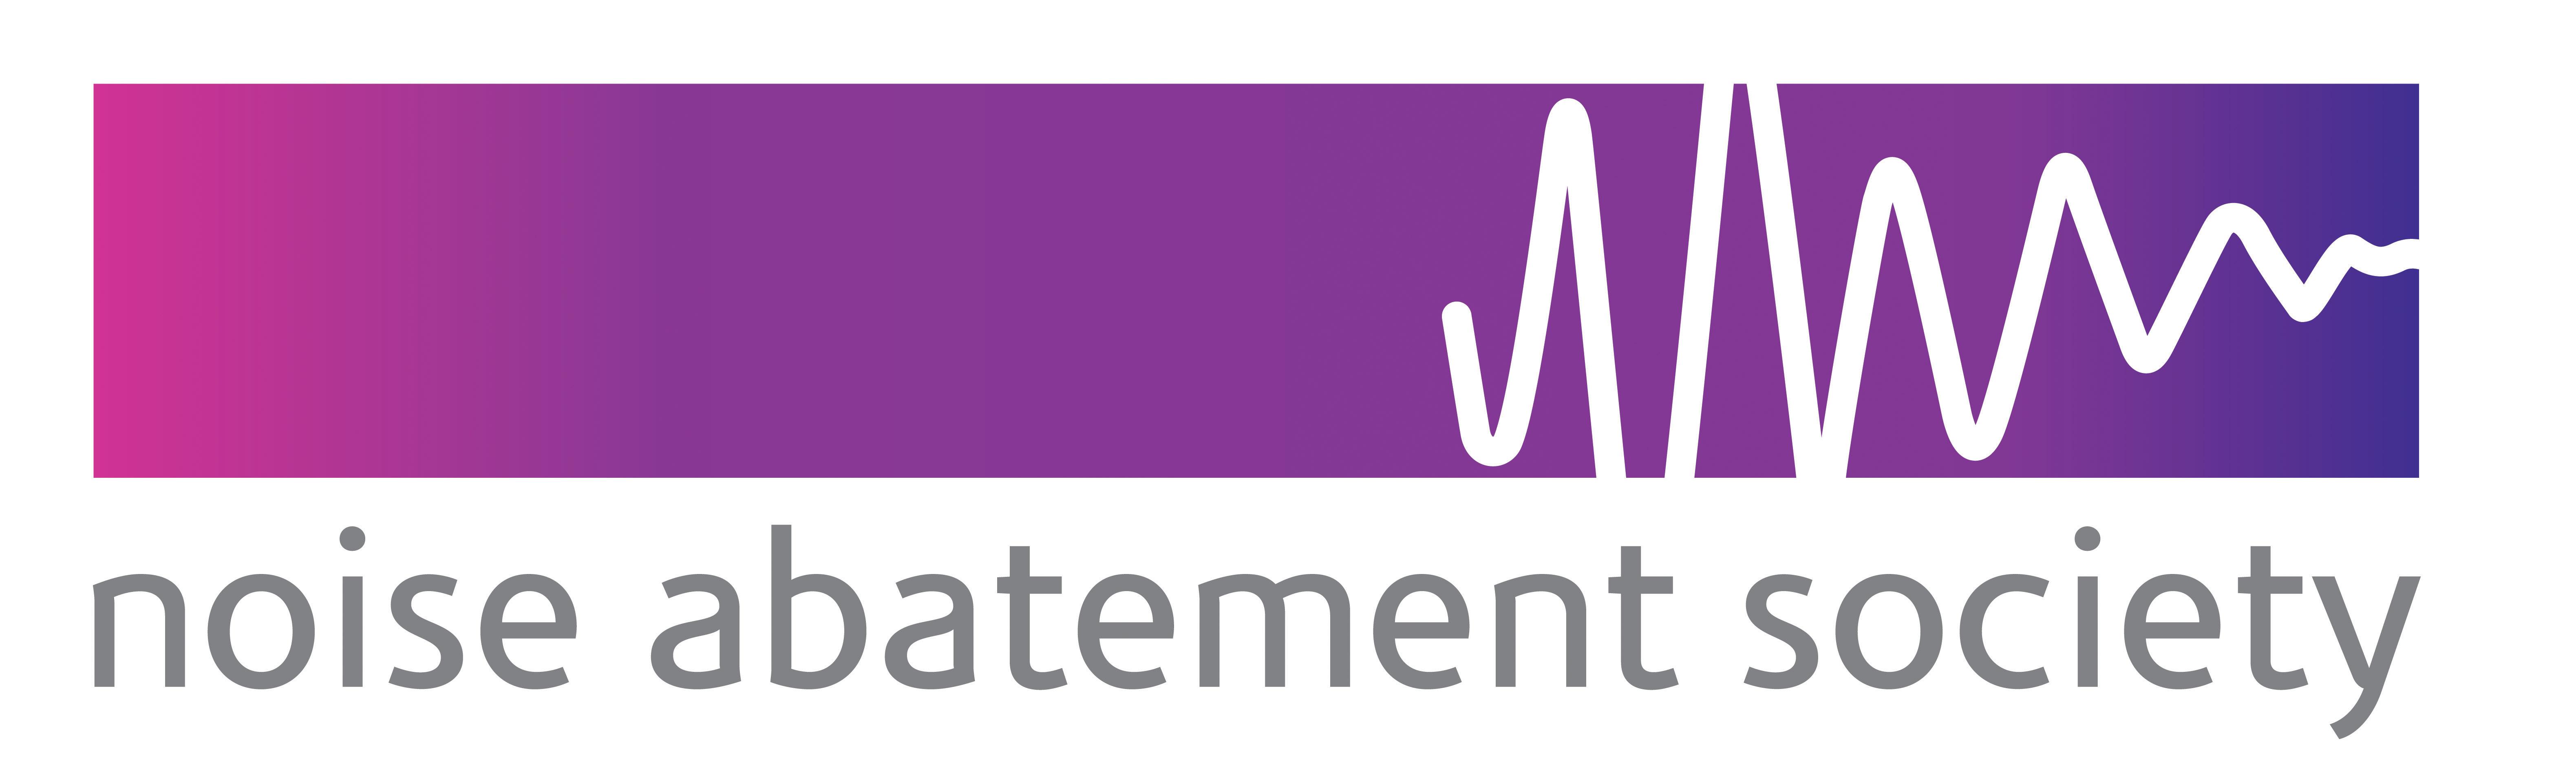 Noise Abatement Society